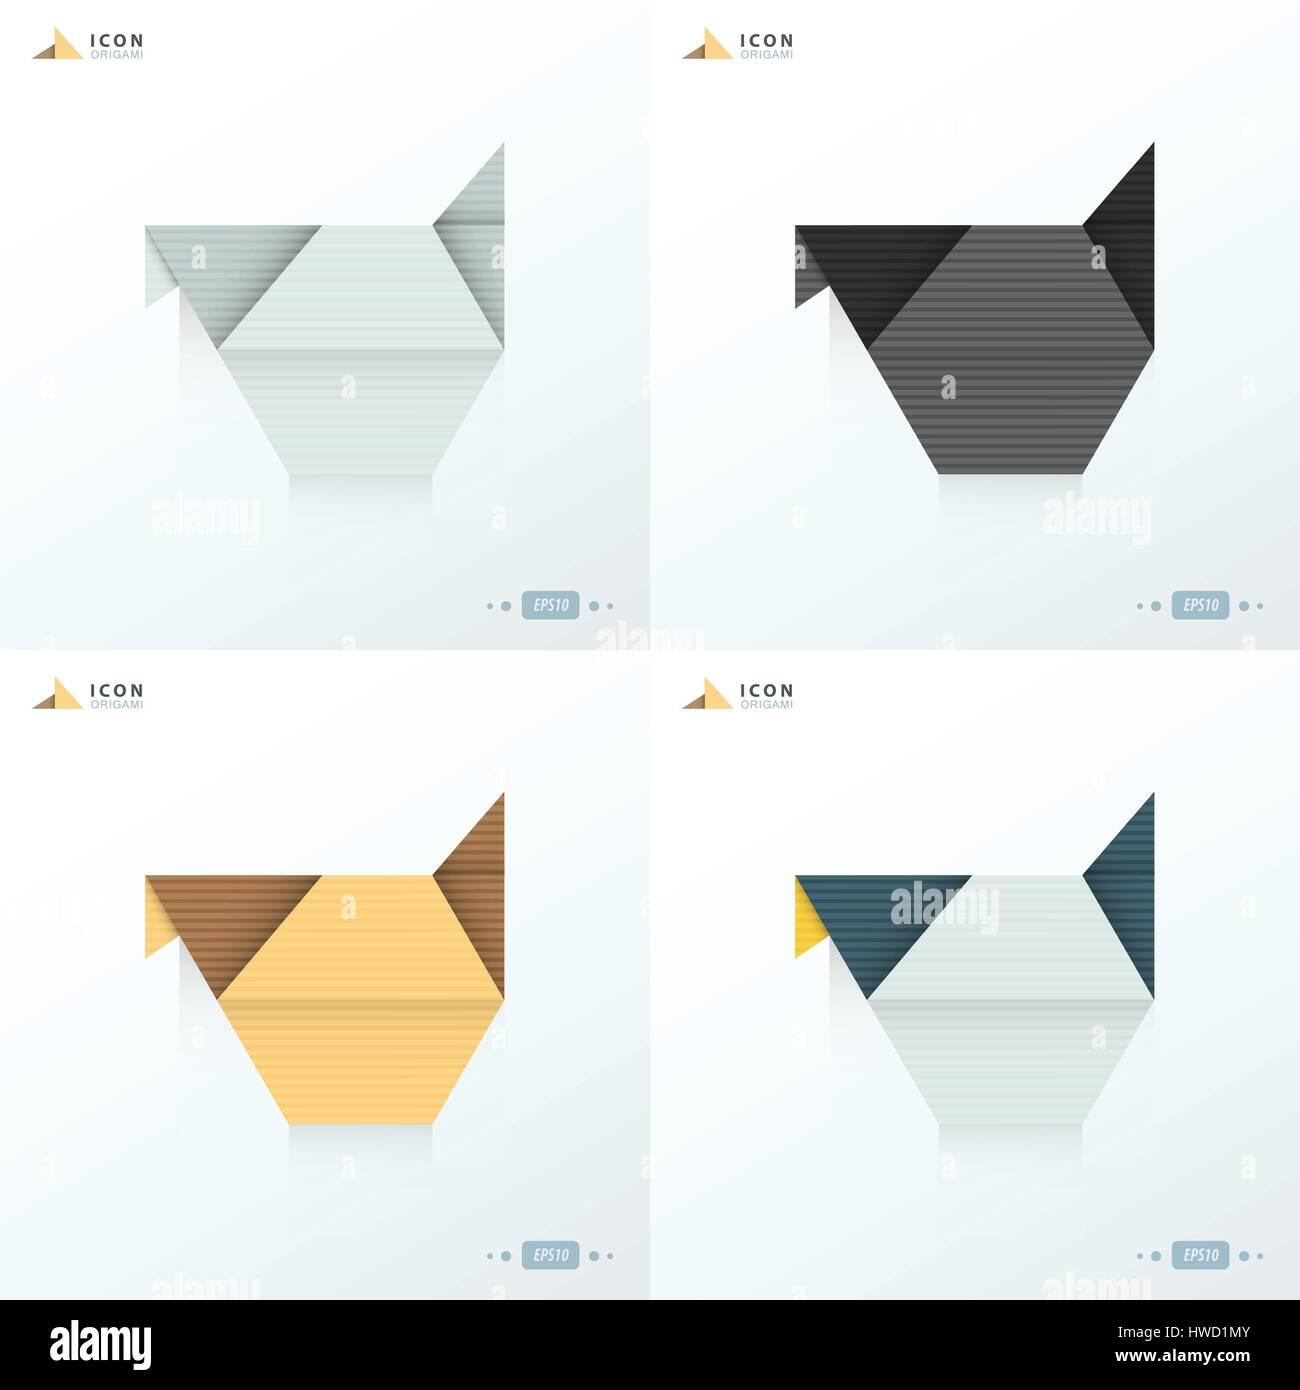 Chicken icon origami set stock vector art illustration vector chicken icon origami set pooptronica